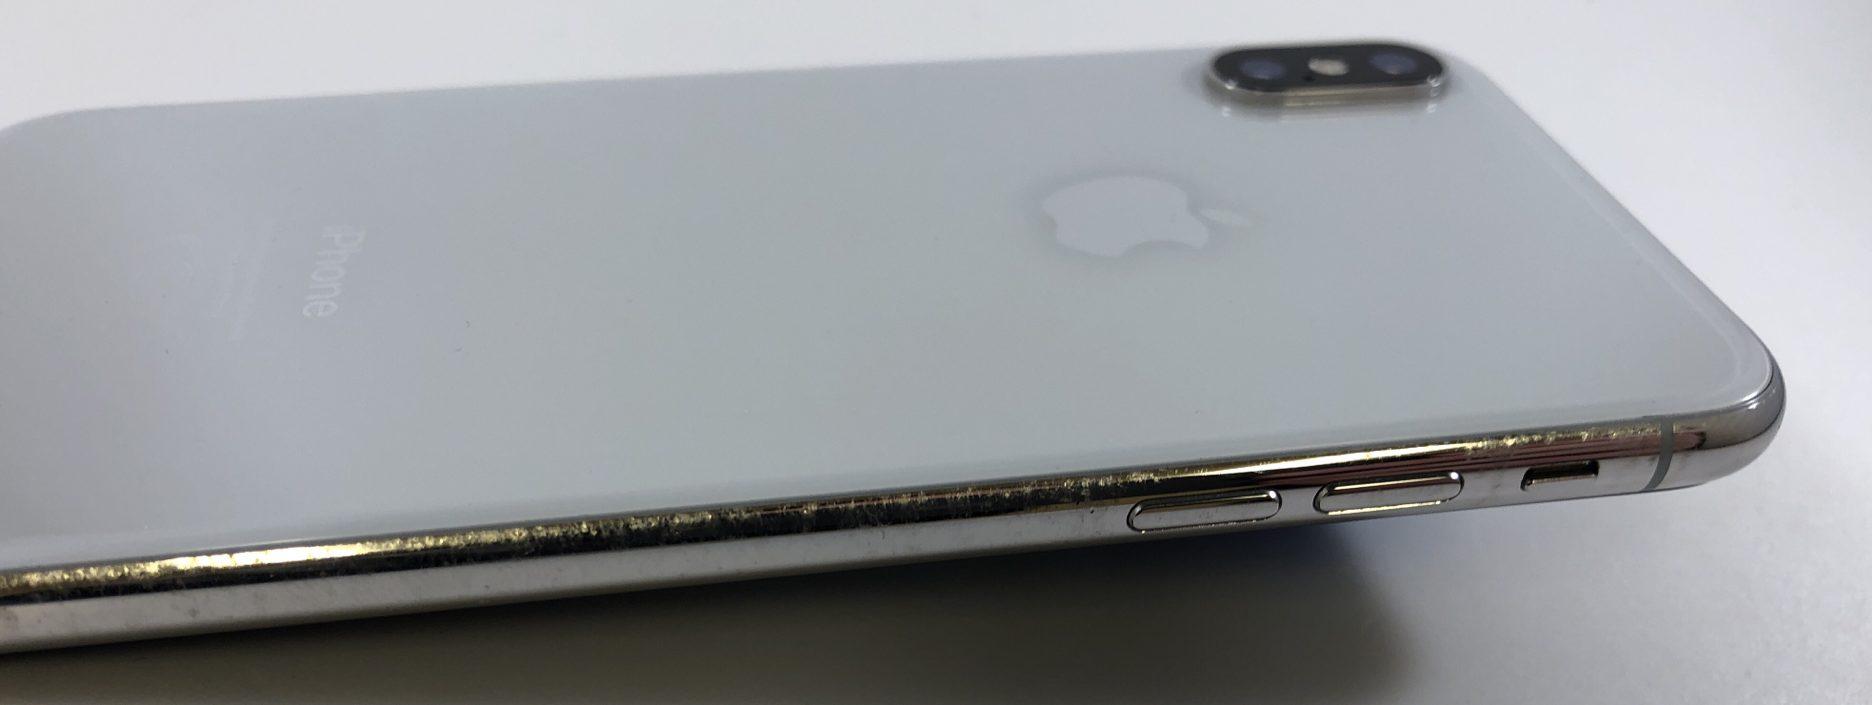 iPhone X 256GB, 256GB, Silver, Bild 4